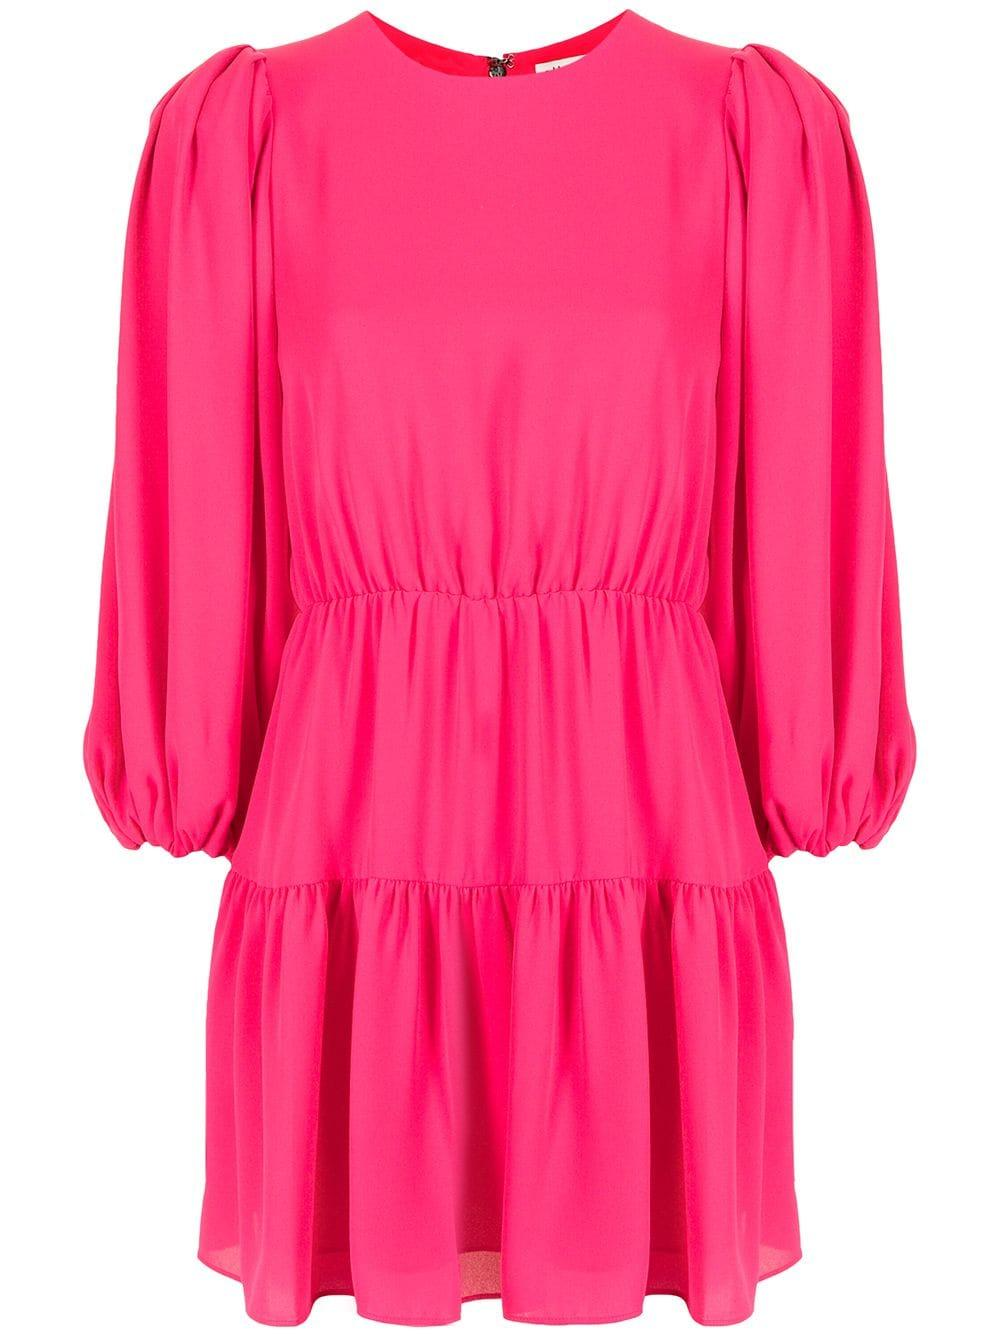 Shayla Puff Sleeve Tiered Dress